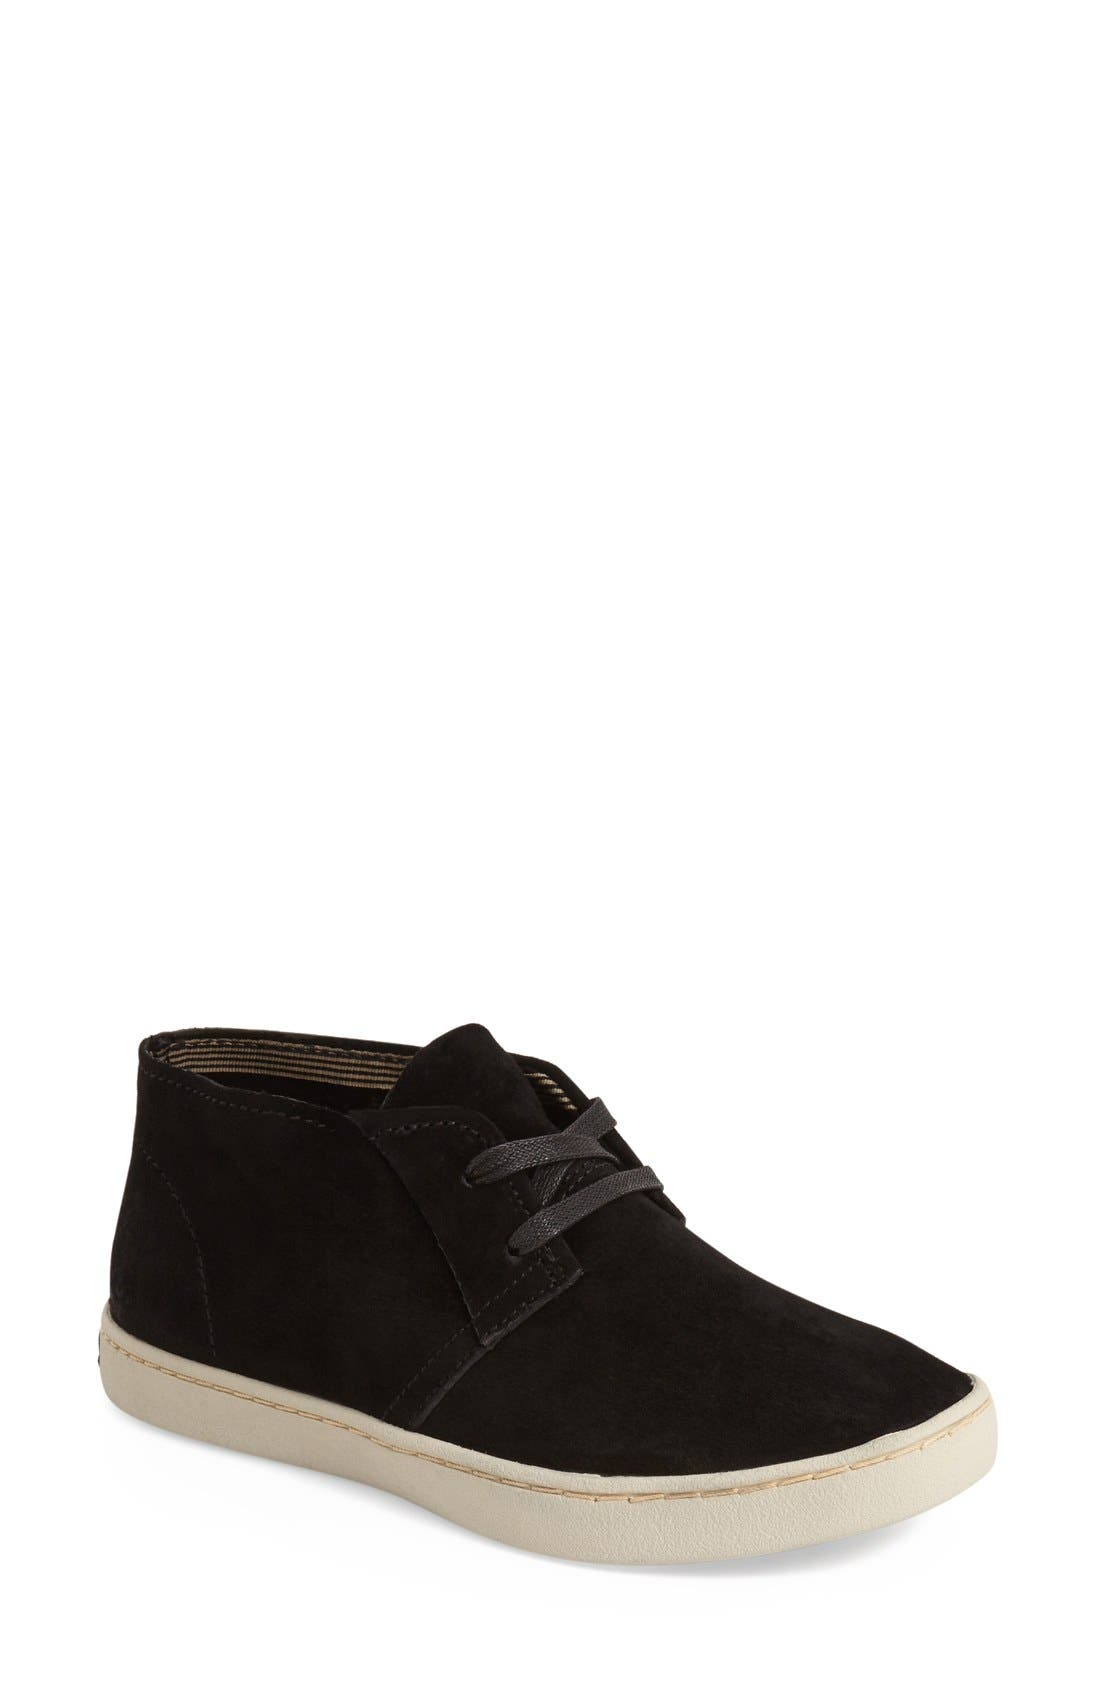 'Cille Gwen' Sneaker,                         Main,                         color,